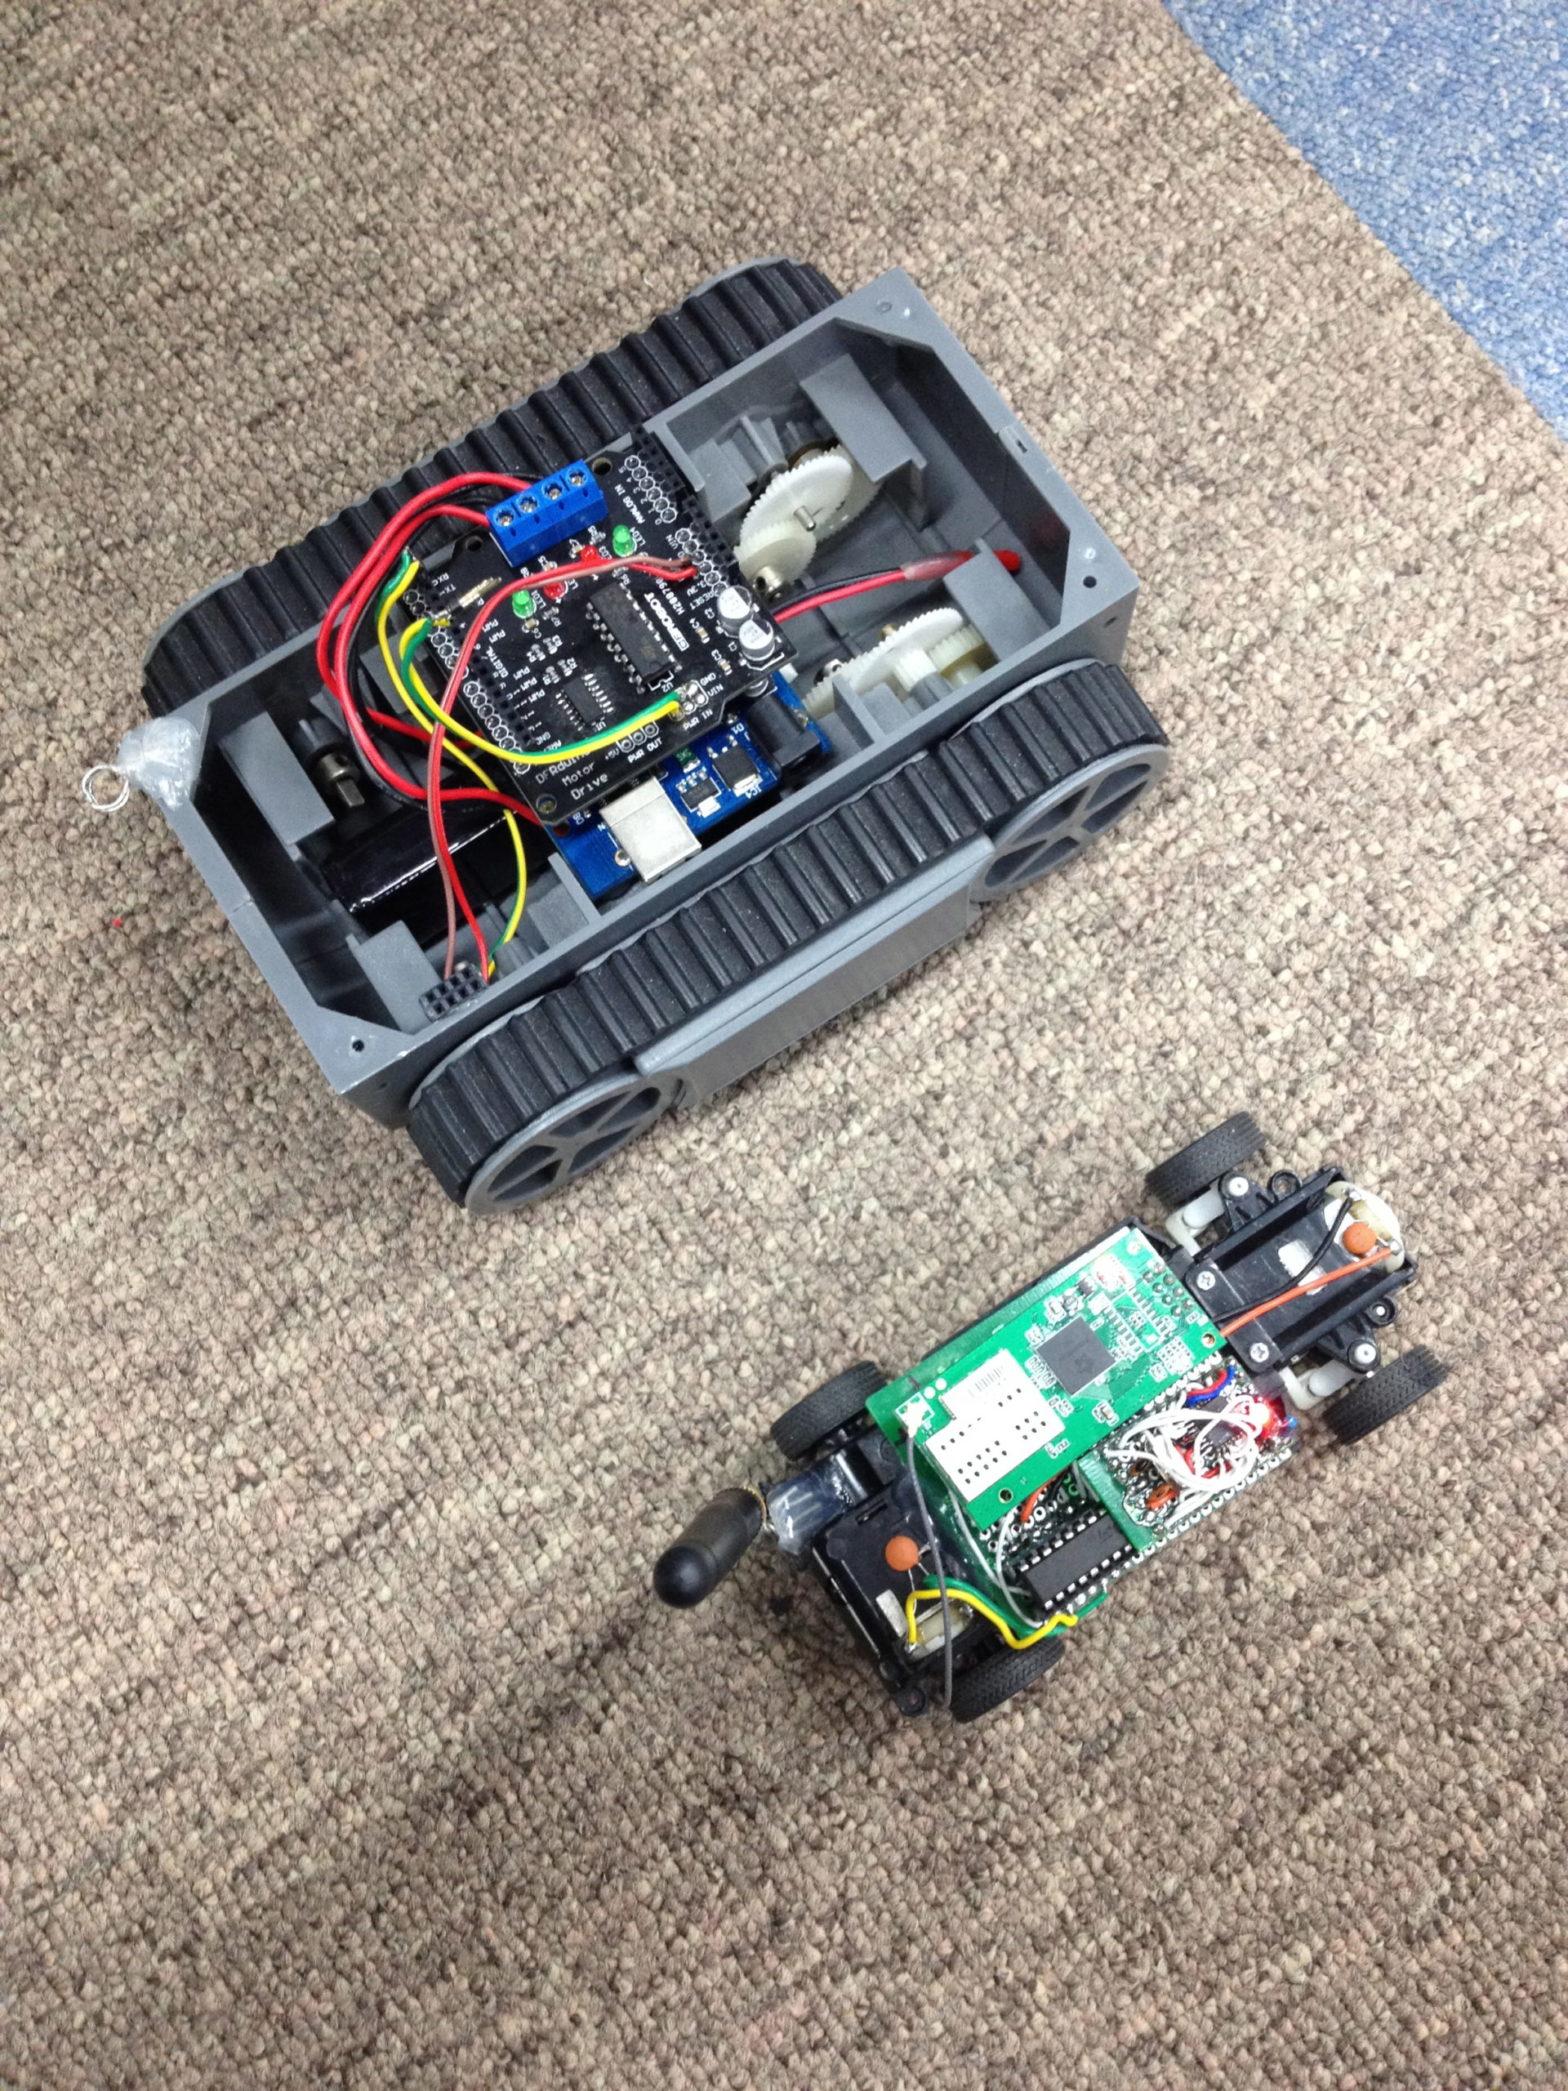 WiFi Toy prototype 2nd